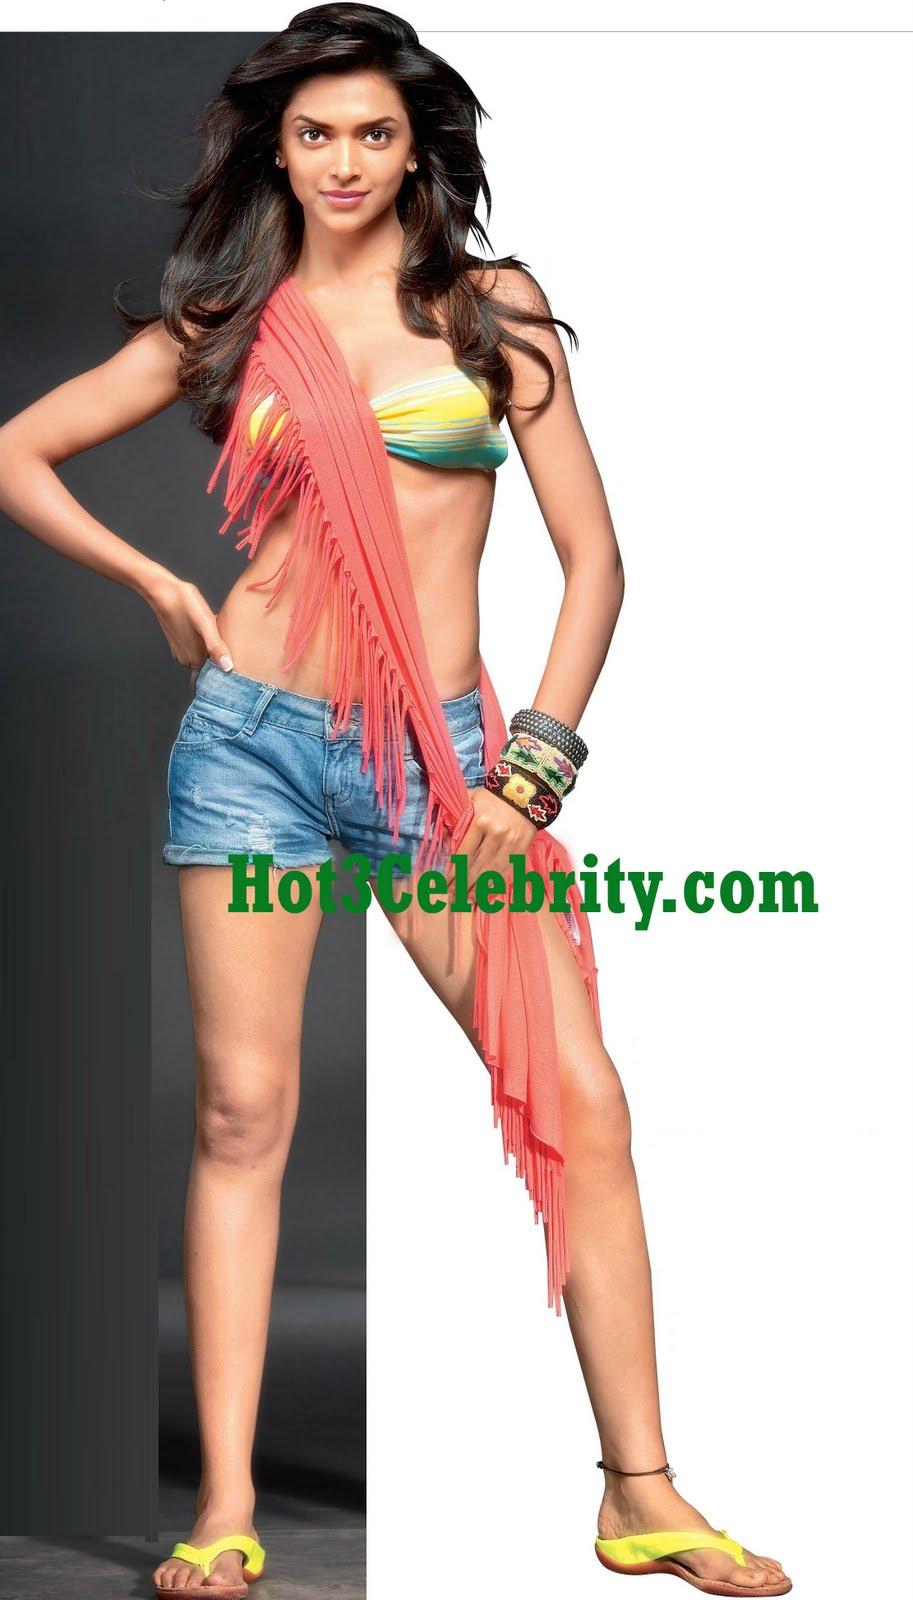 Deepika padukonxzdvfdse in bikini Showing her Beautiful Legs%252Bcopy free sexy secretary galleries thumbnails. New portal devoted to nude over 30 ...